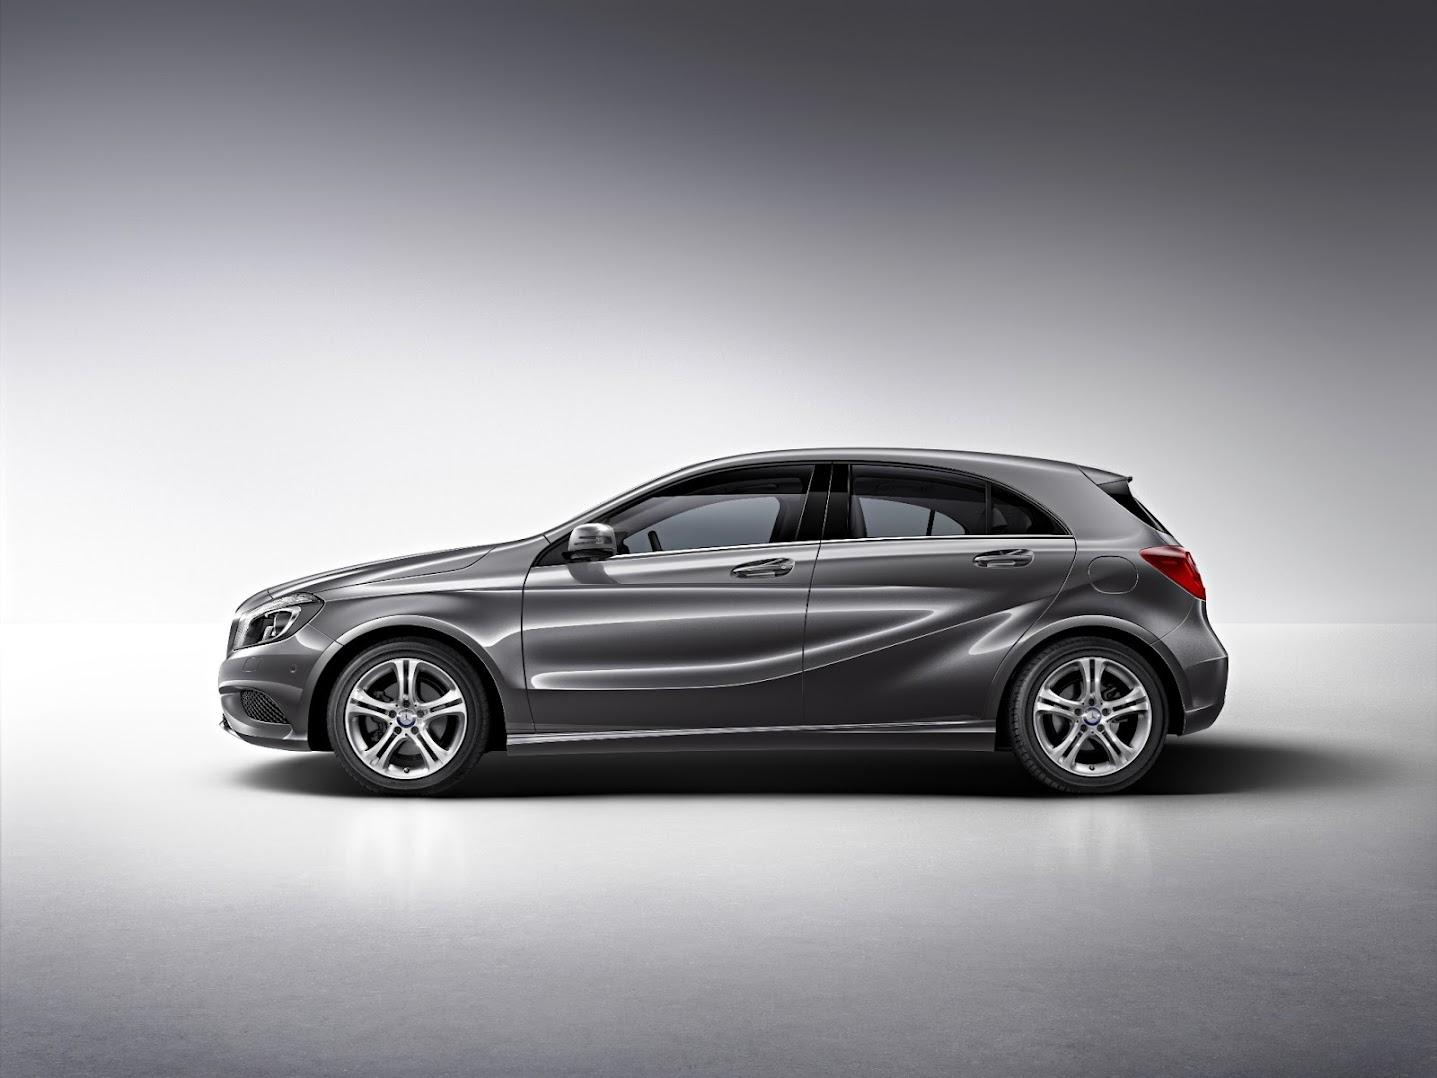 *Mercedes-Benz The new A-Class 跟著蔡依林搭載小鋼砲新血來襲:「PROJECT A+」萬人電音派對! 8